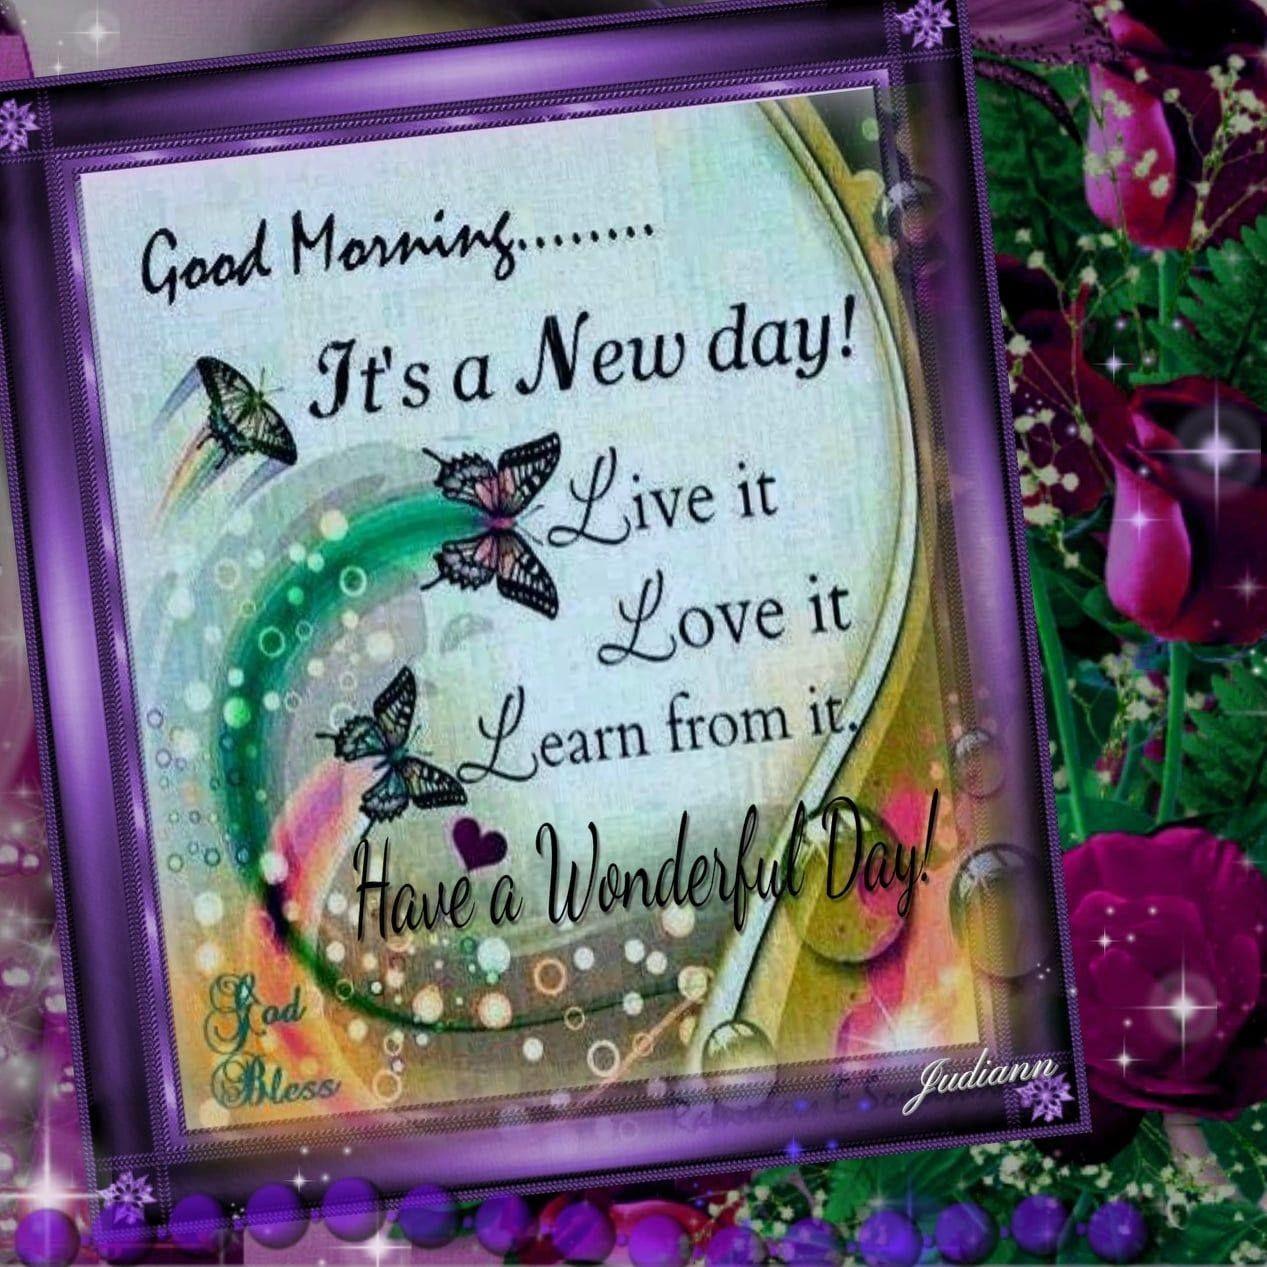 It's a new day! Live it, Love it, Learn From It